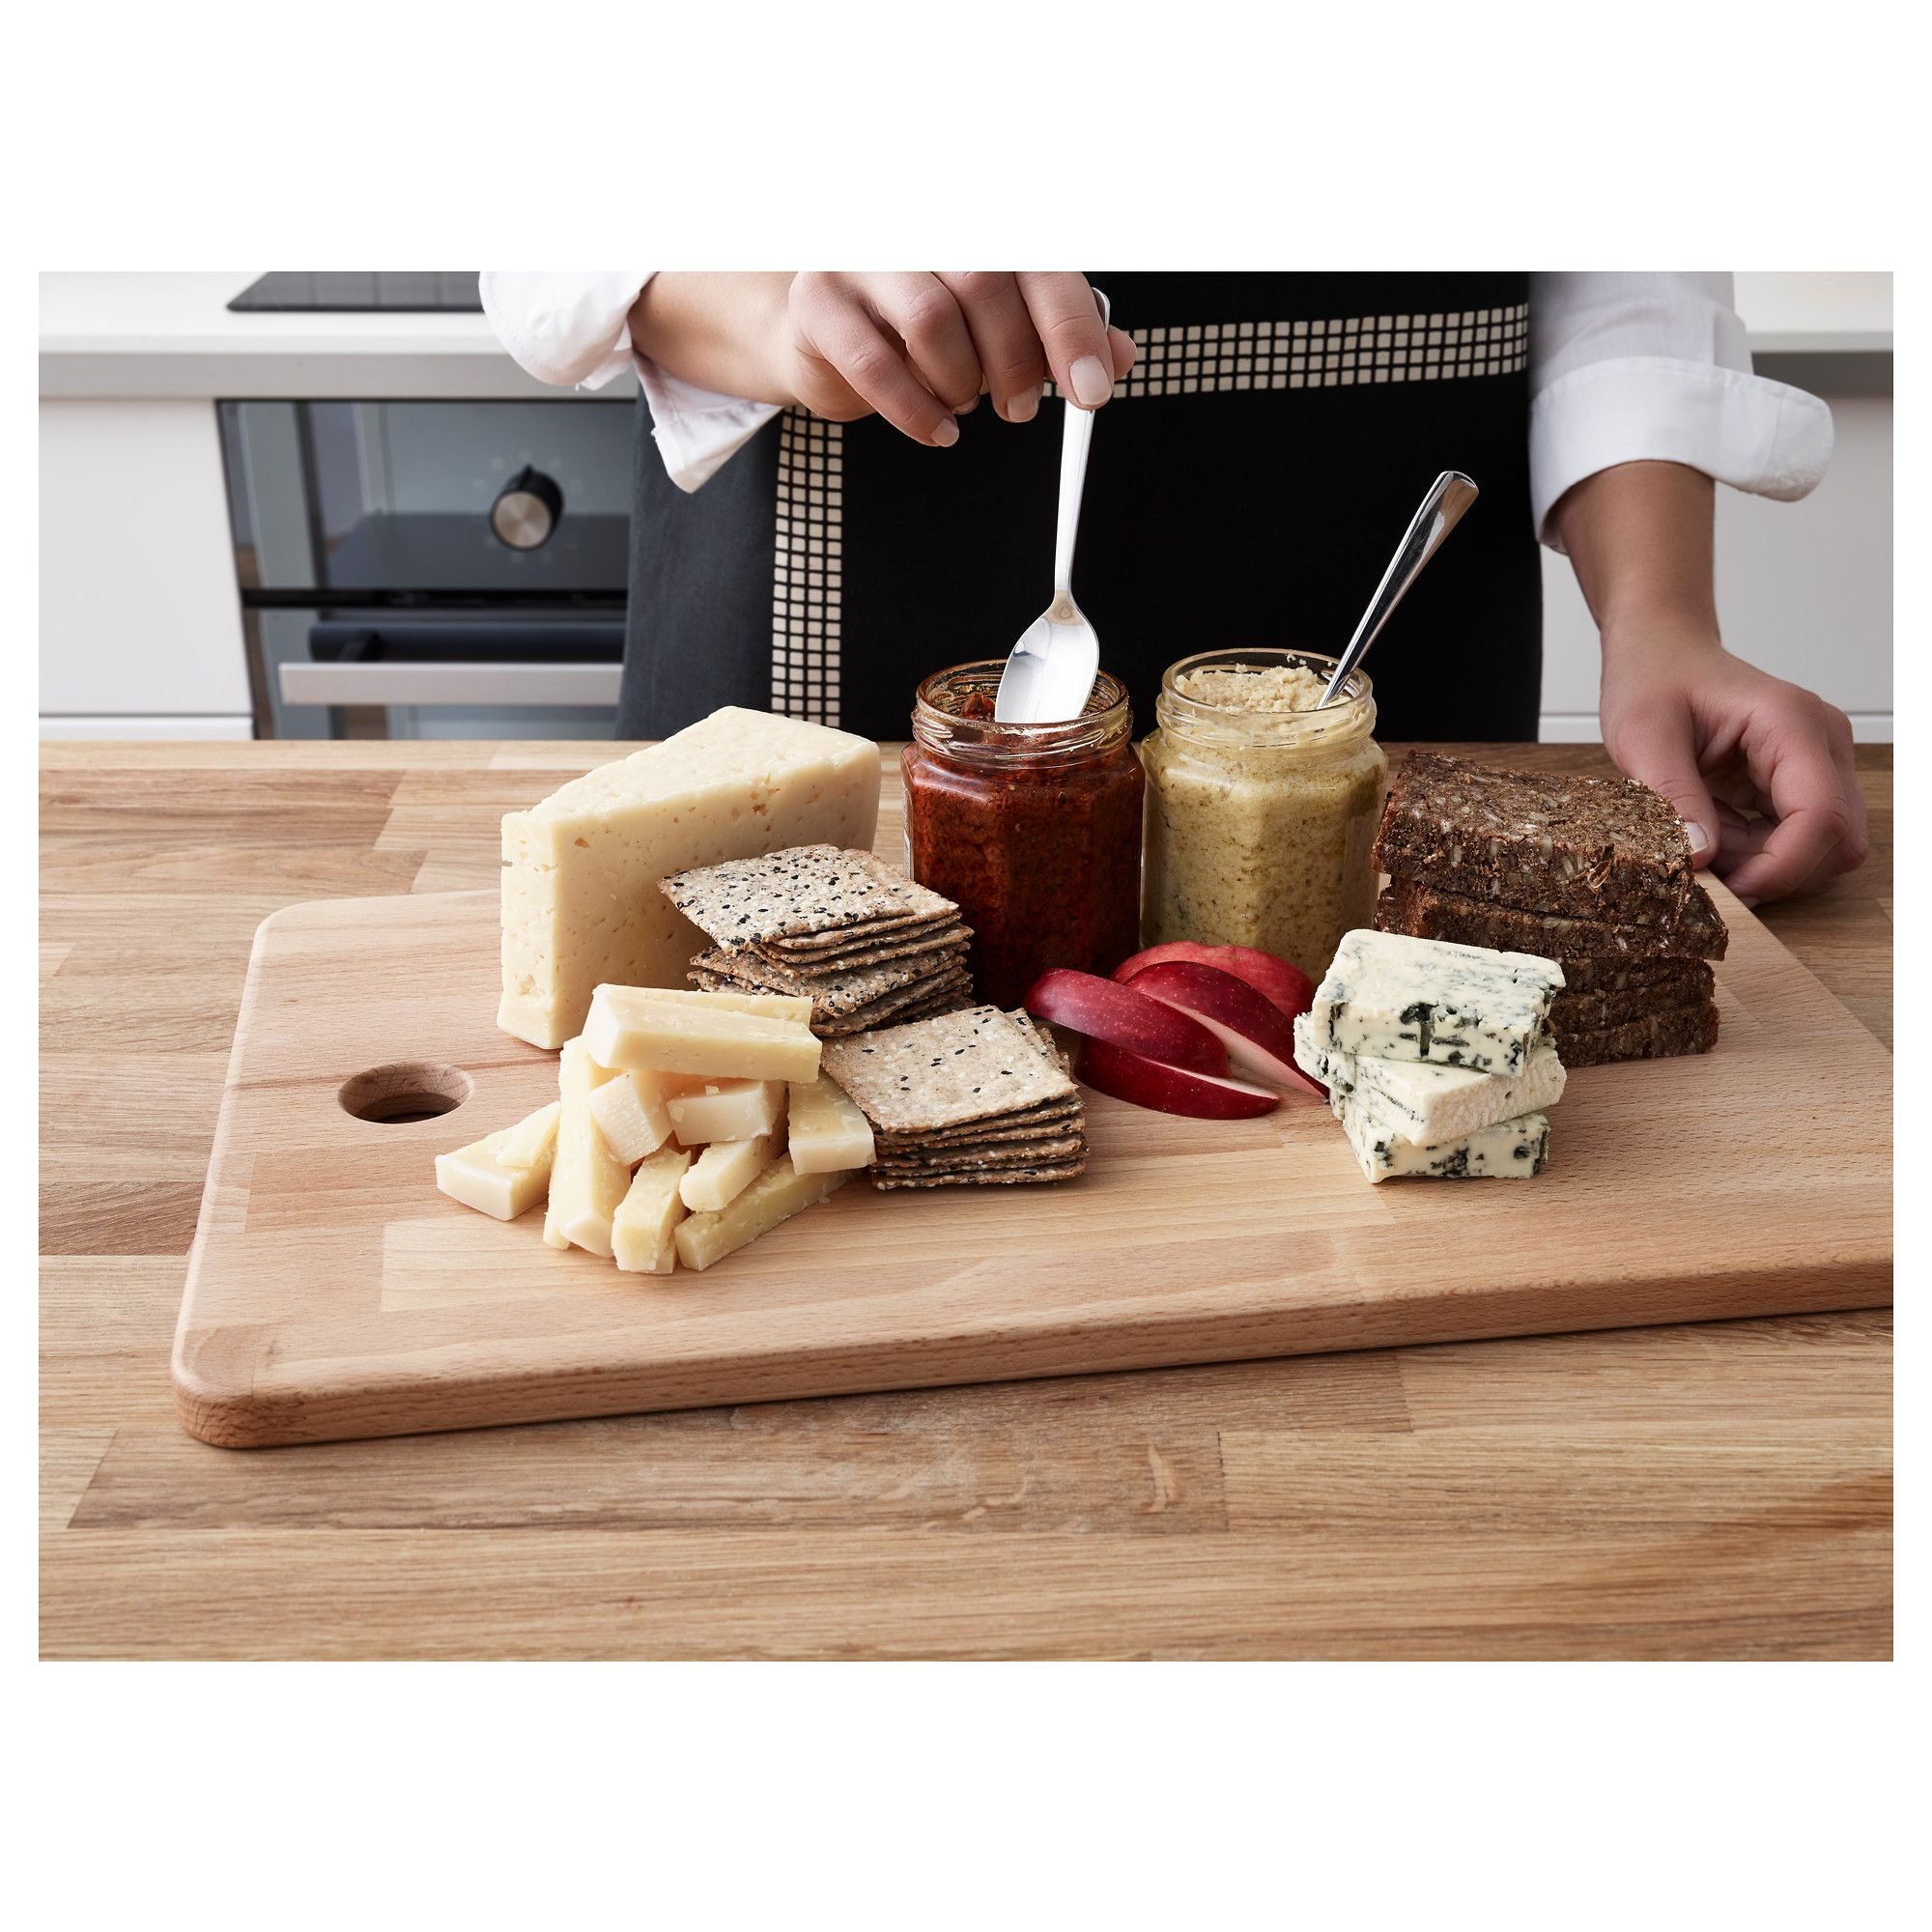 IKEA - PROPPMÄTT Chopping board beech | Products | Ikea